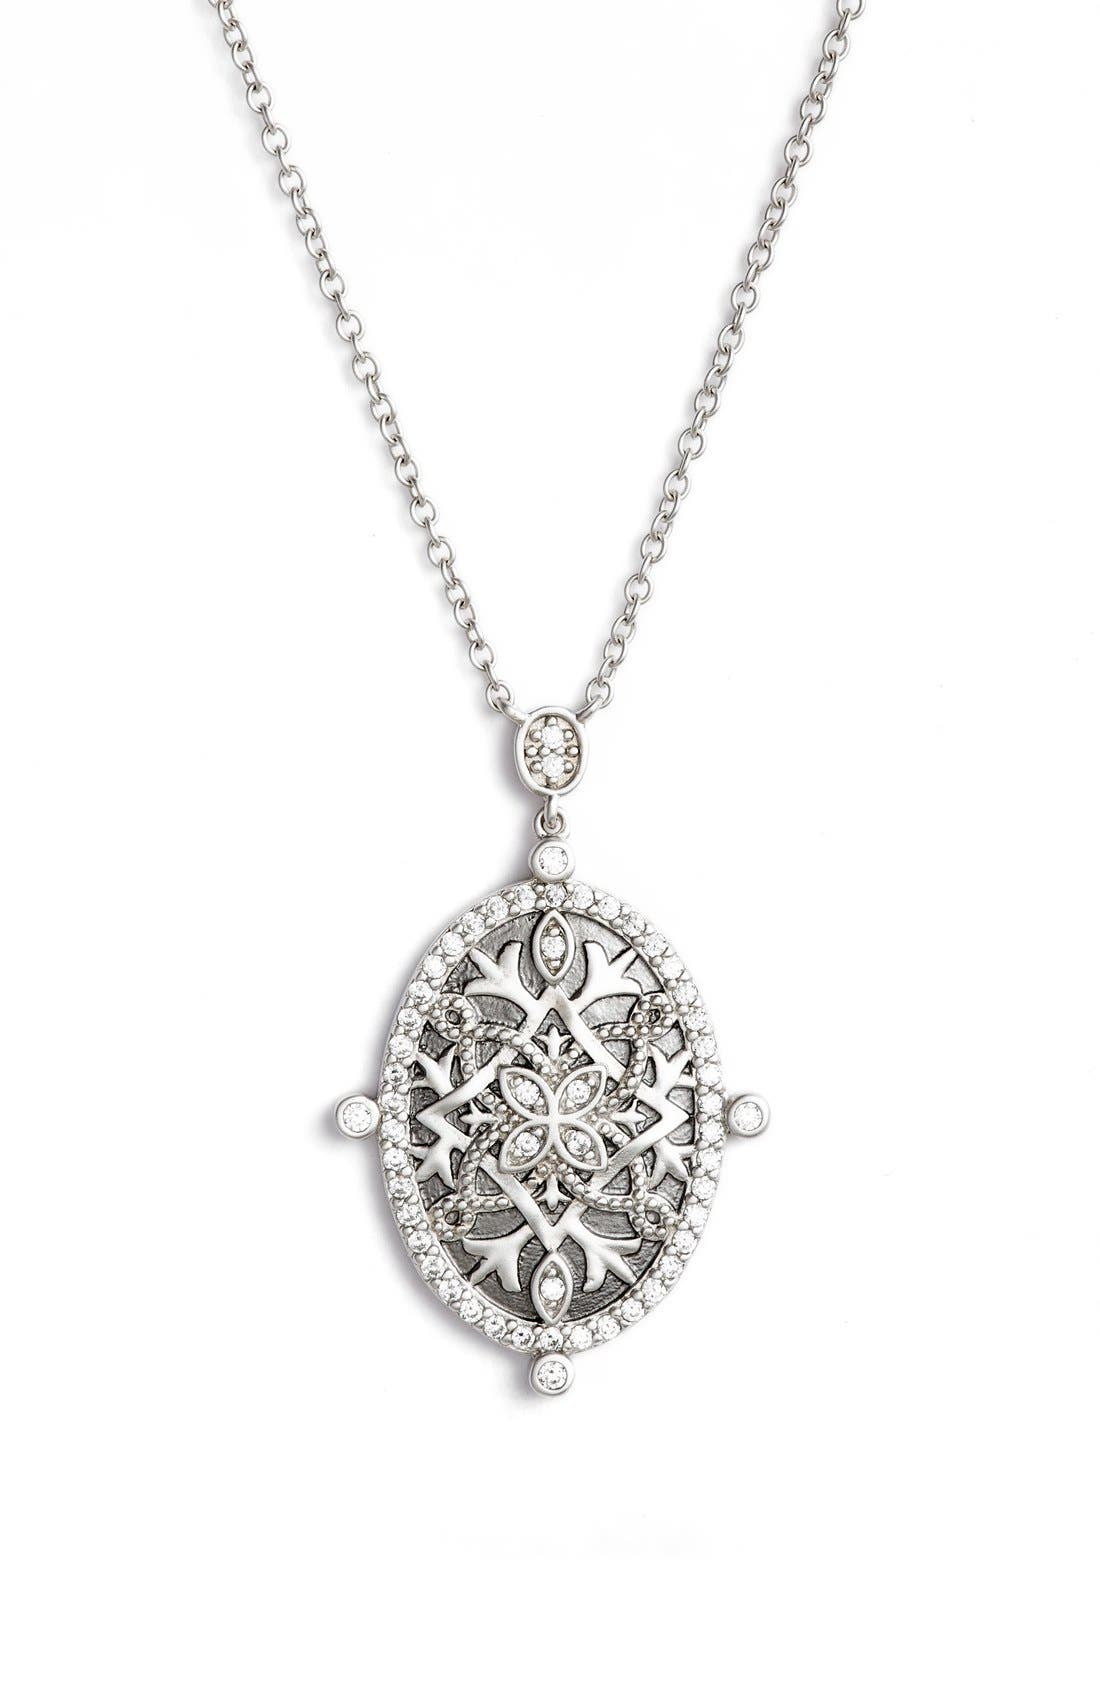 Contemporary Deco Celestial Pendant Necklace,                             Main thumbnail 1, color,                             Silver/ Black